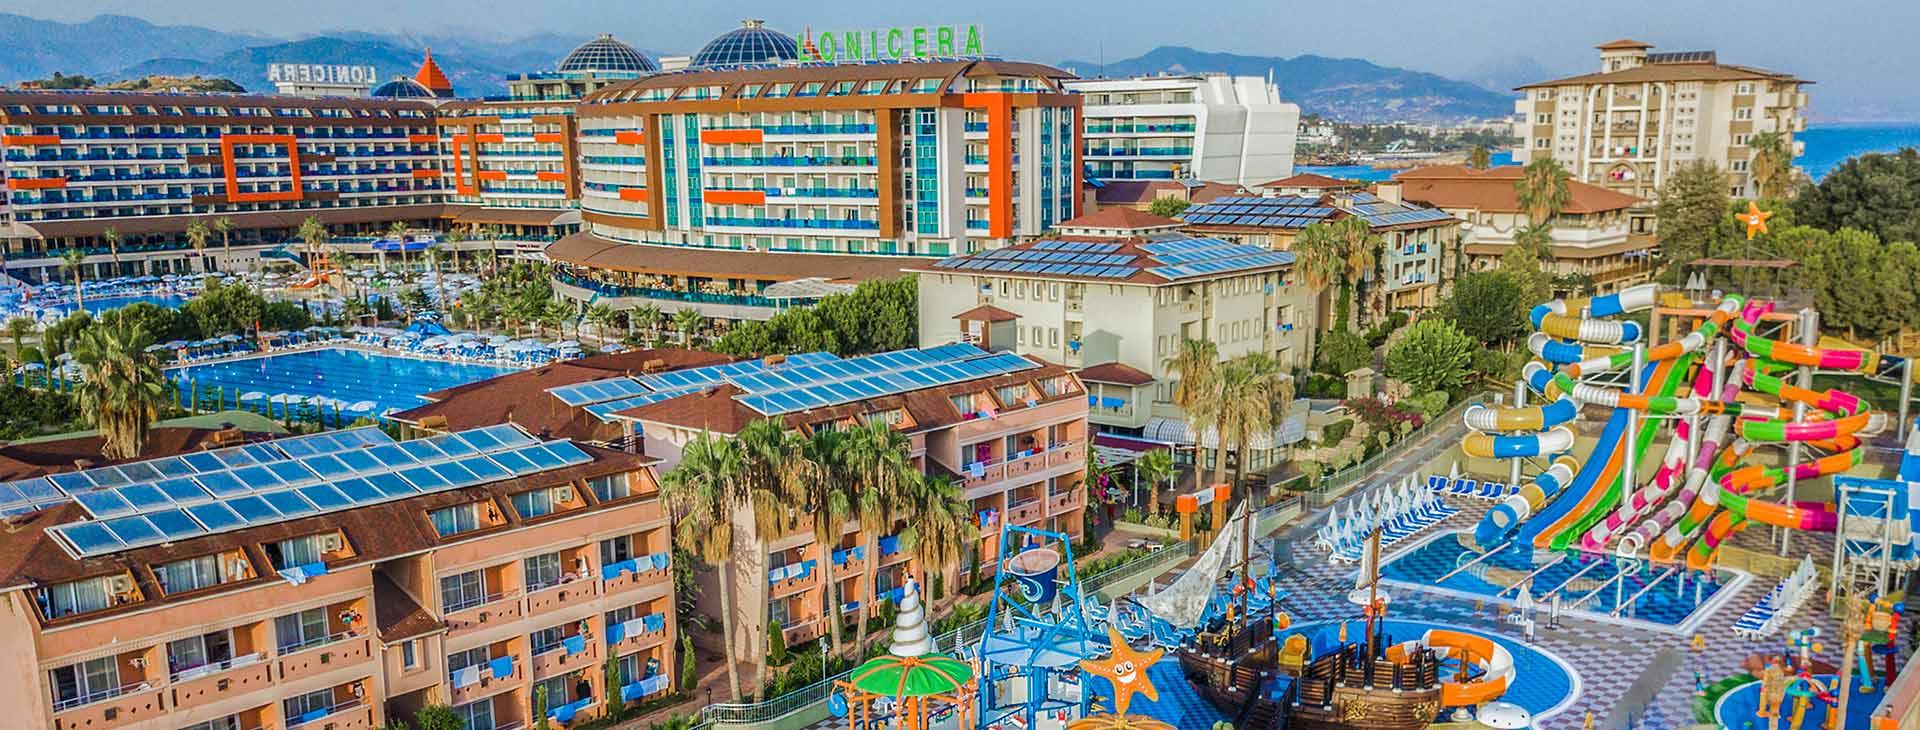 Lonicera Resort And Spa Rainbow